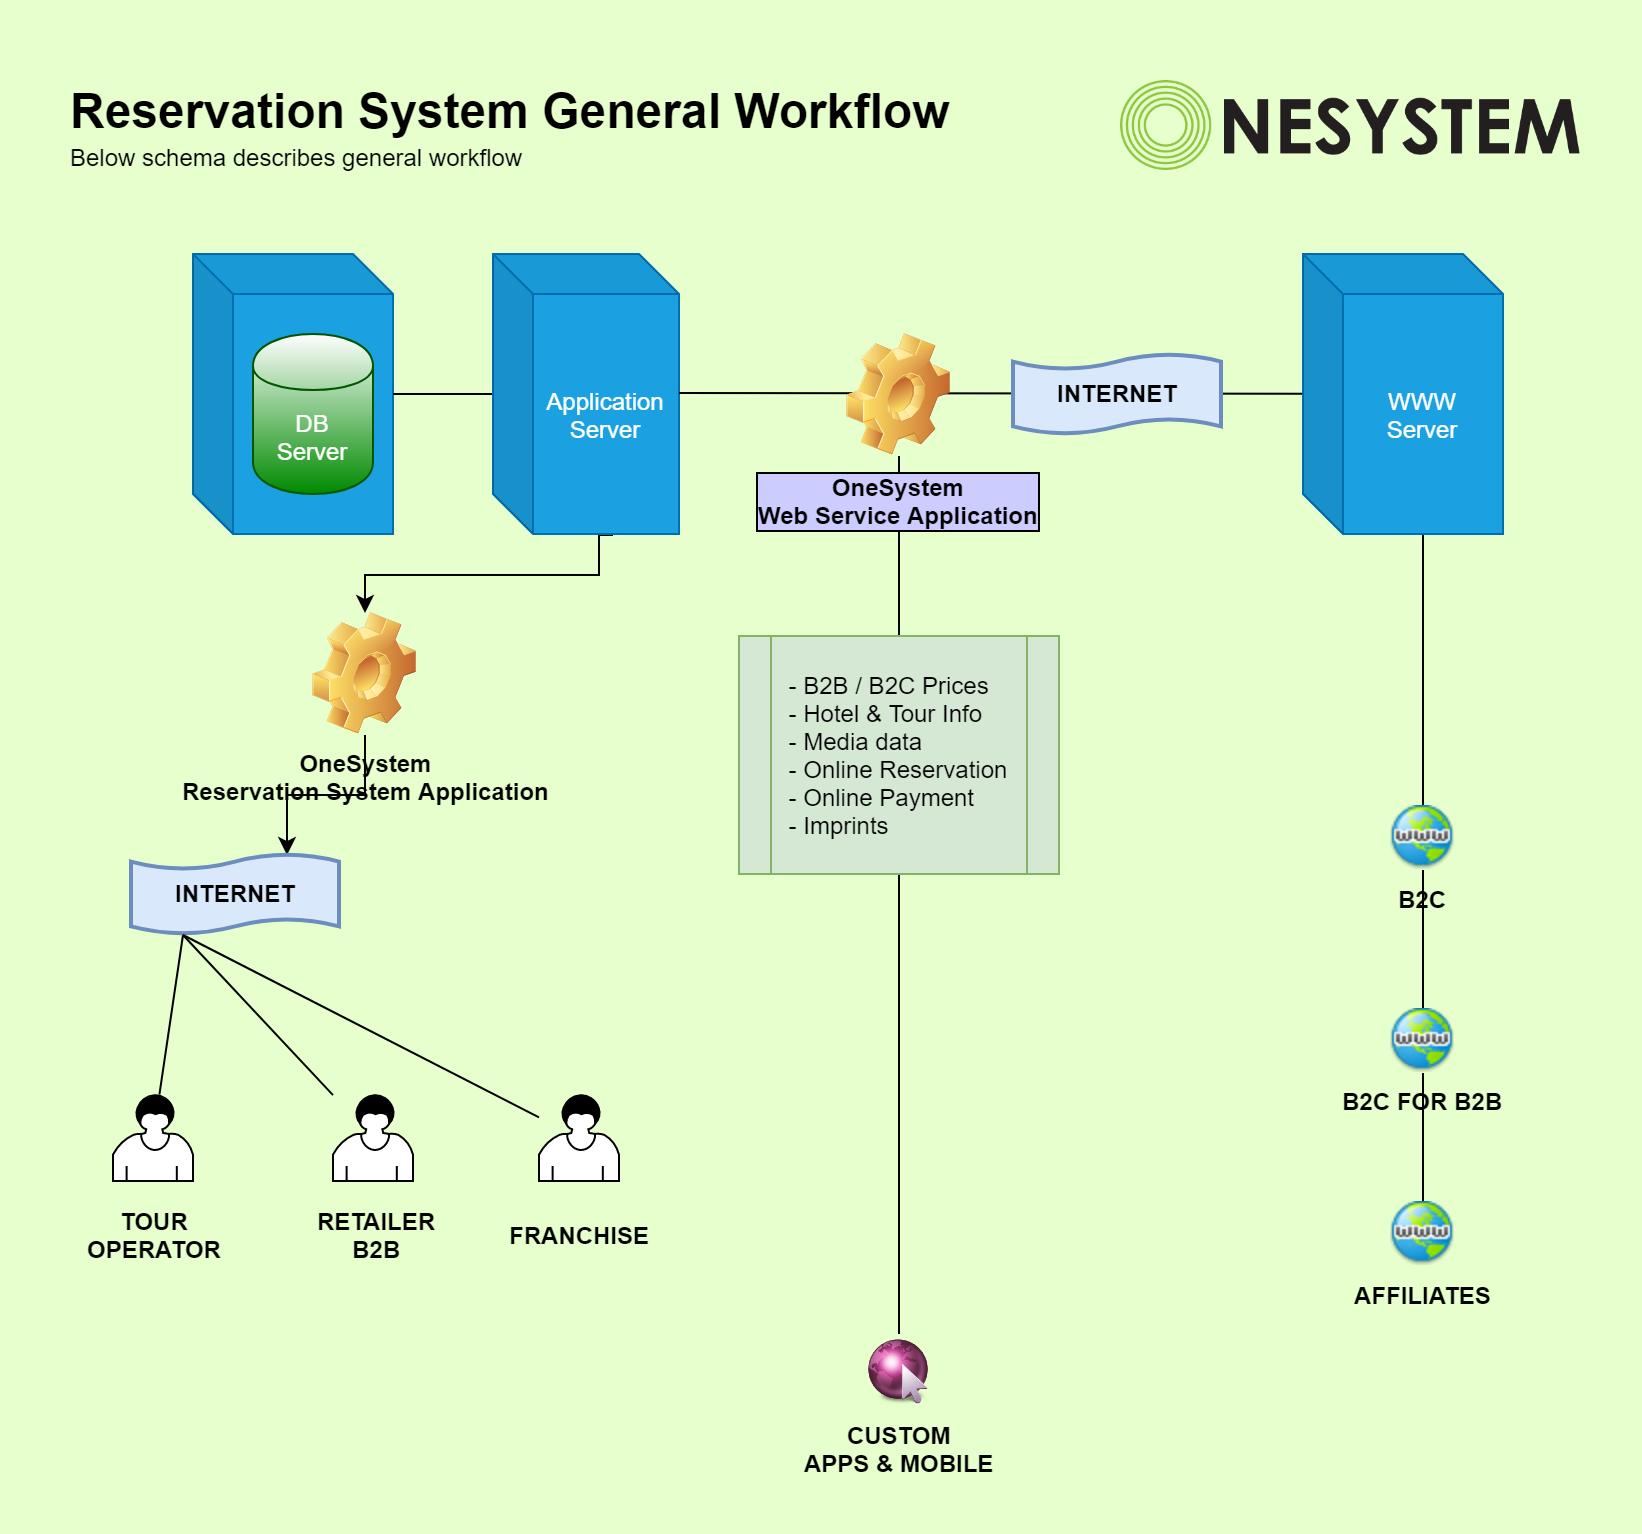 Reservation System General Workflow